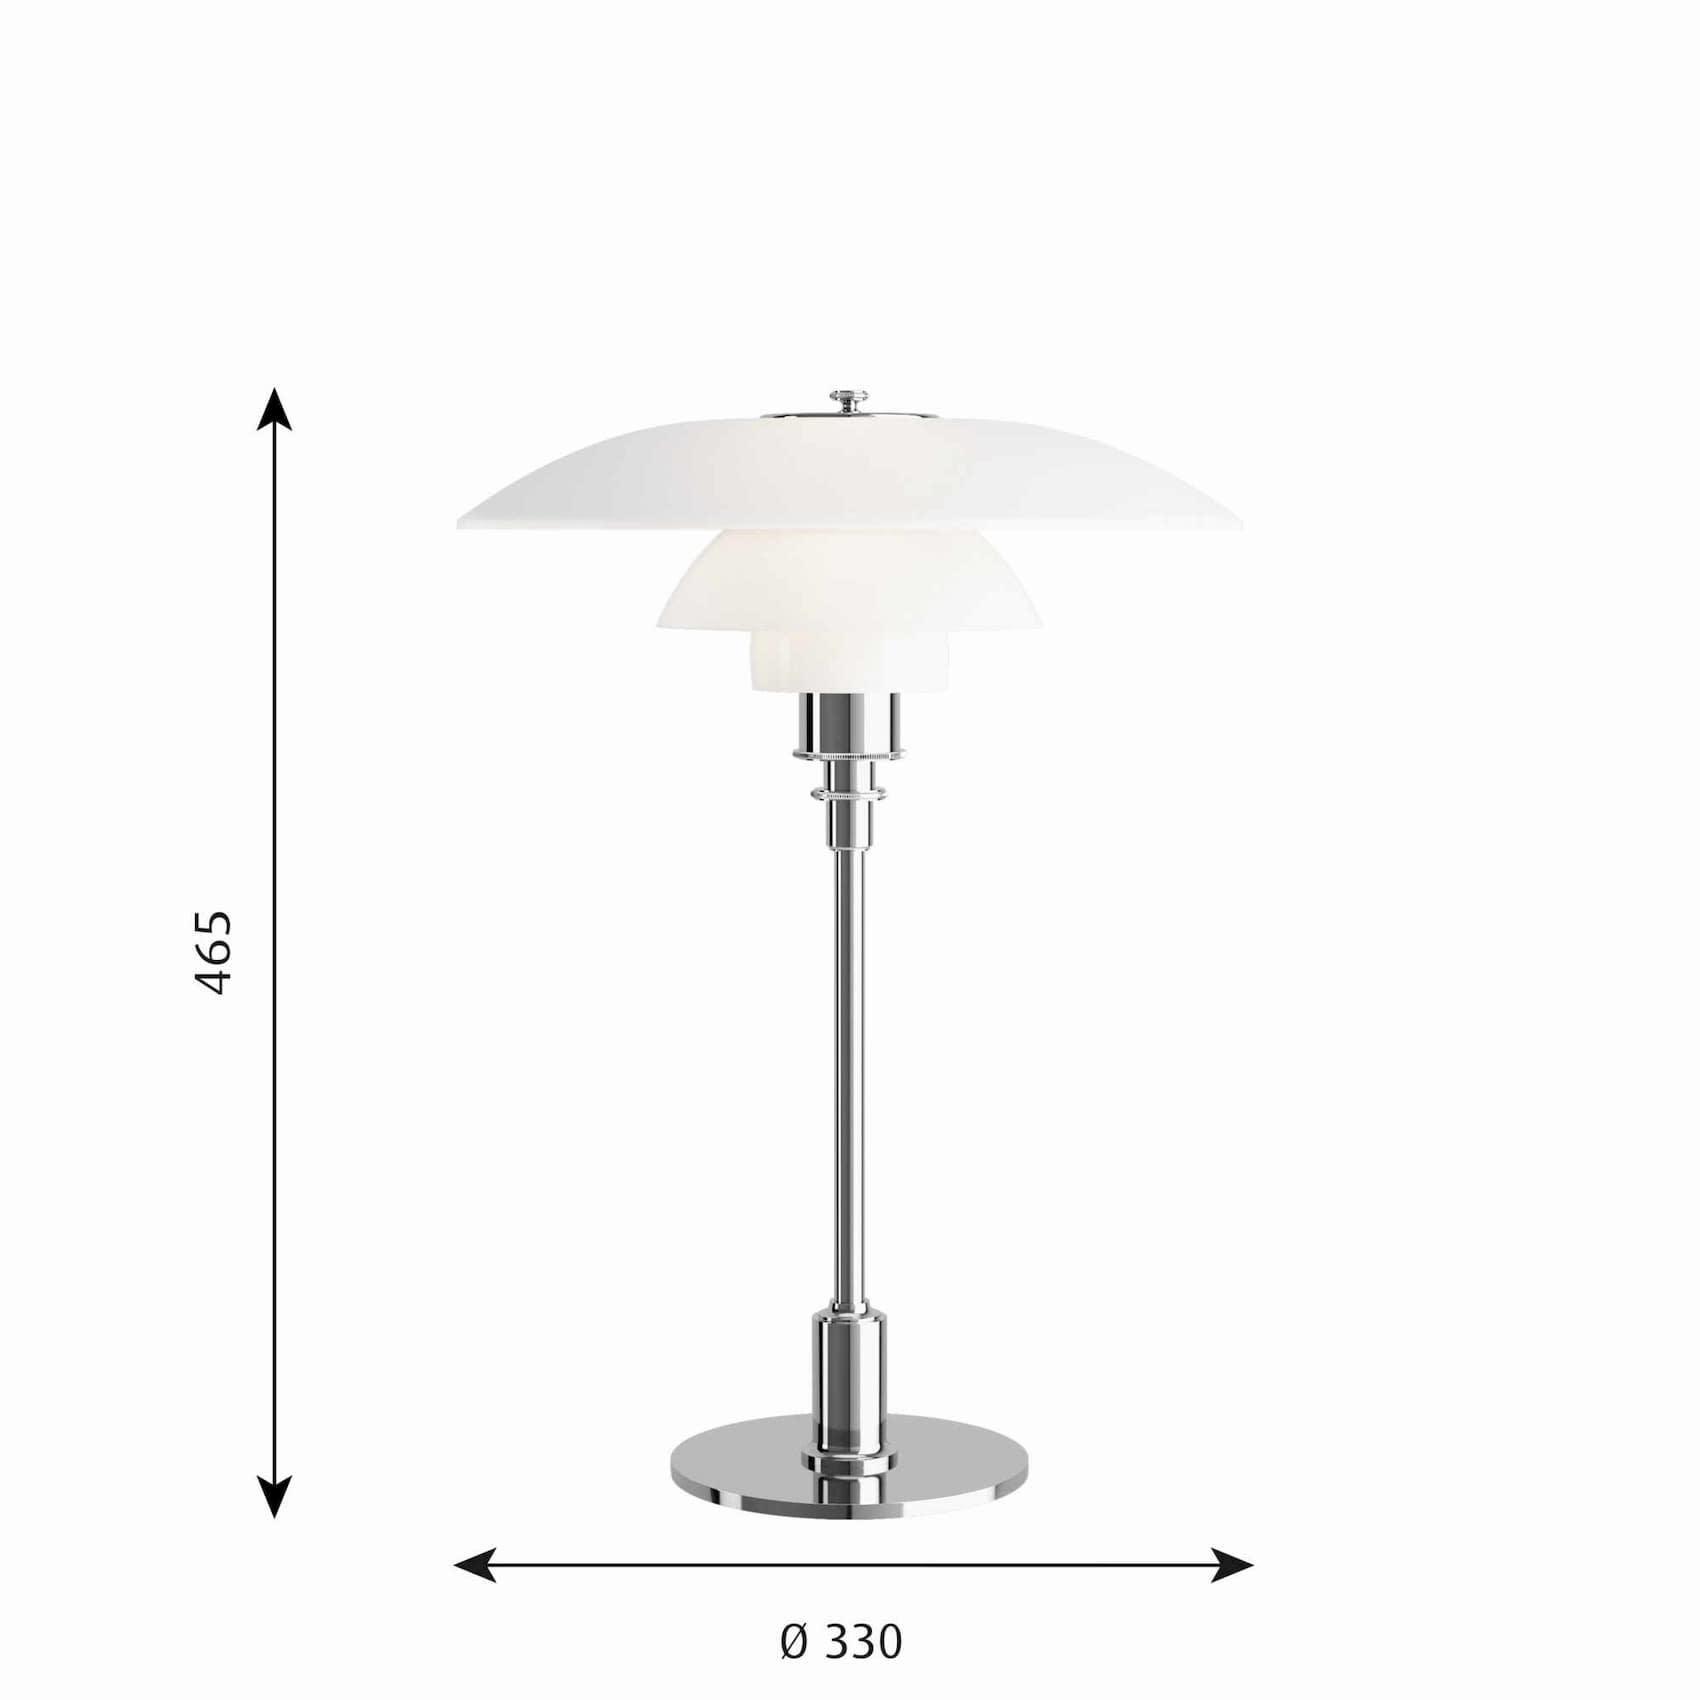 louis-poulsen-ph-3-2-lamp-dimensions